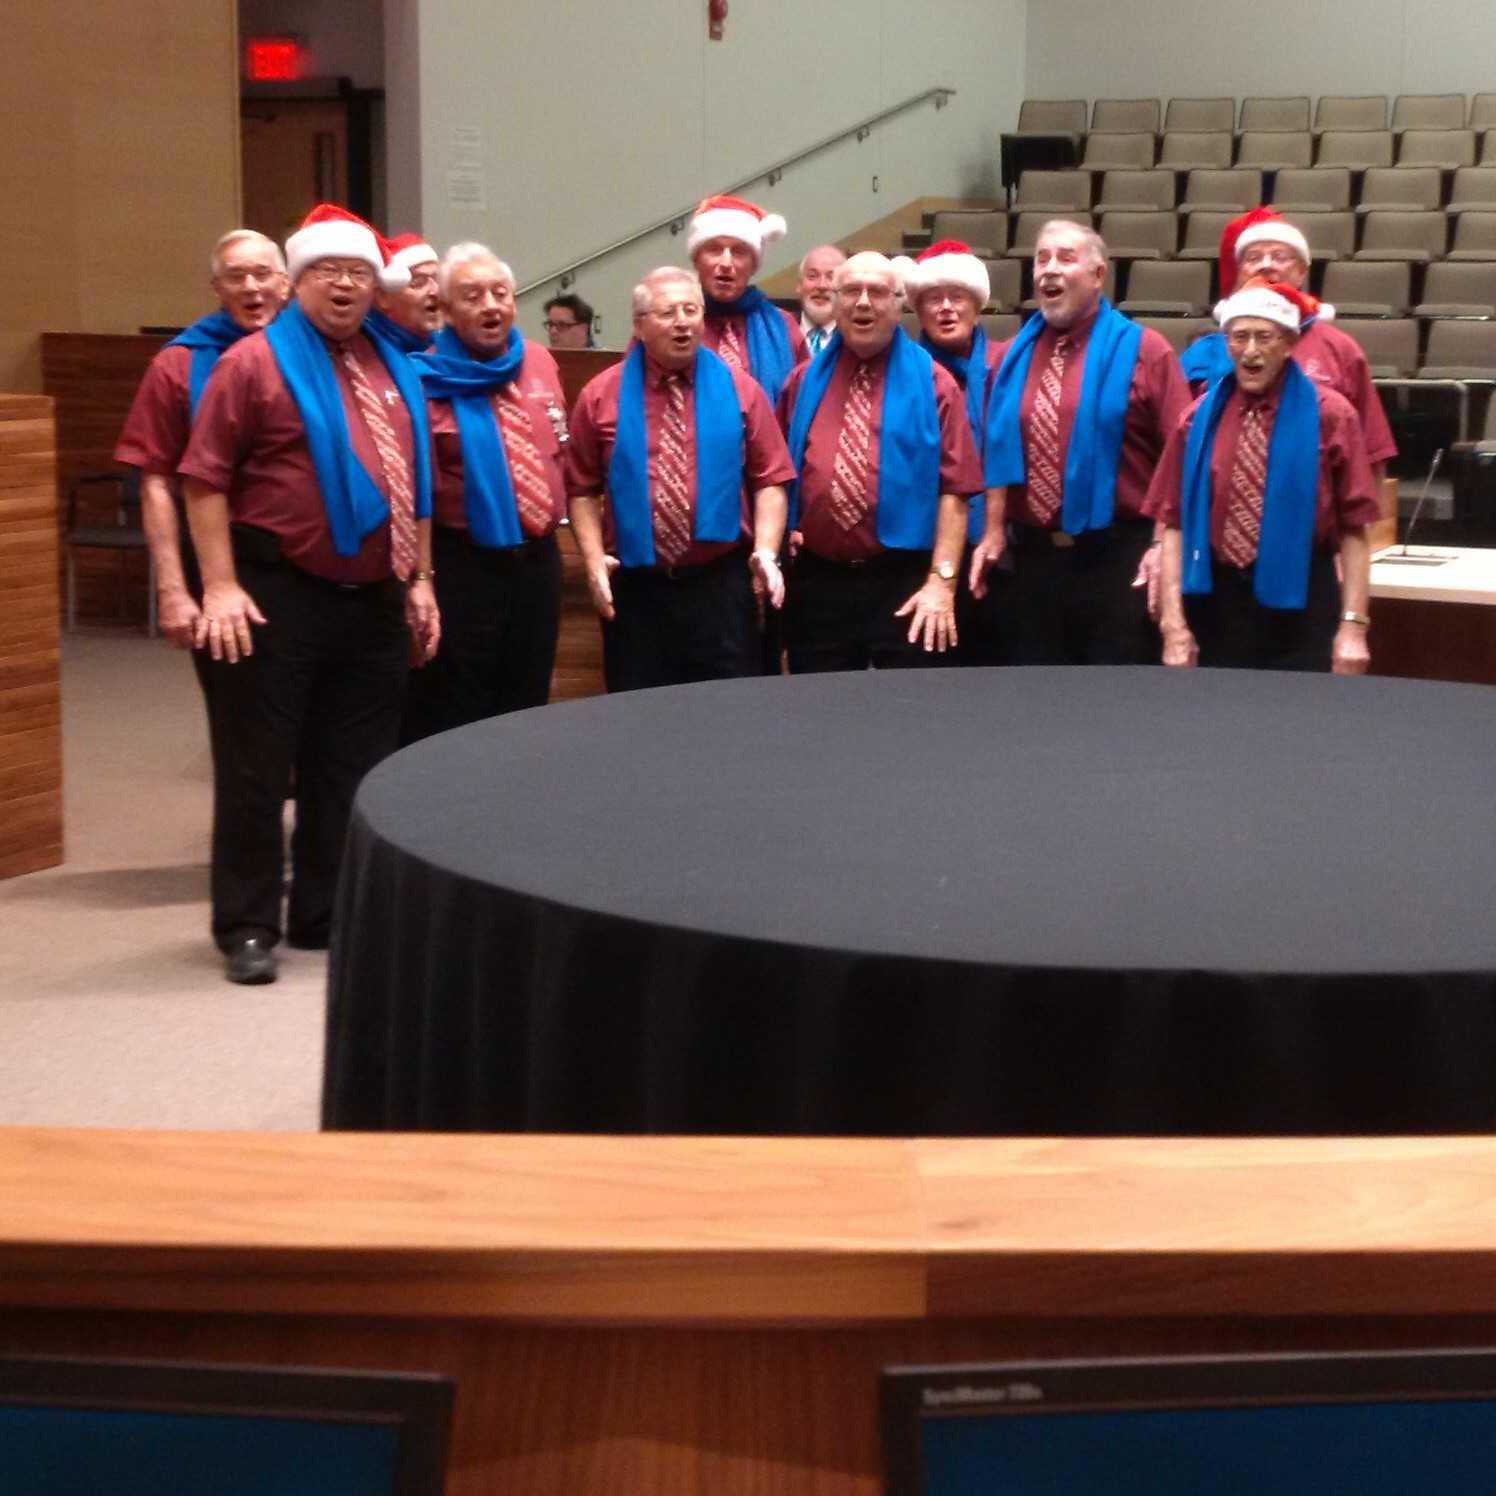 Pre-City Council meeting entertainment courtesy of The Baker's Dozen @cityofguelph https://t.co/ByEXwqkOem